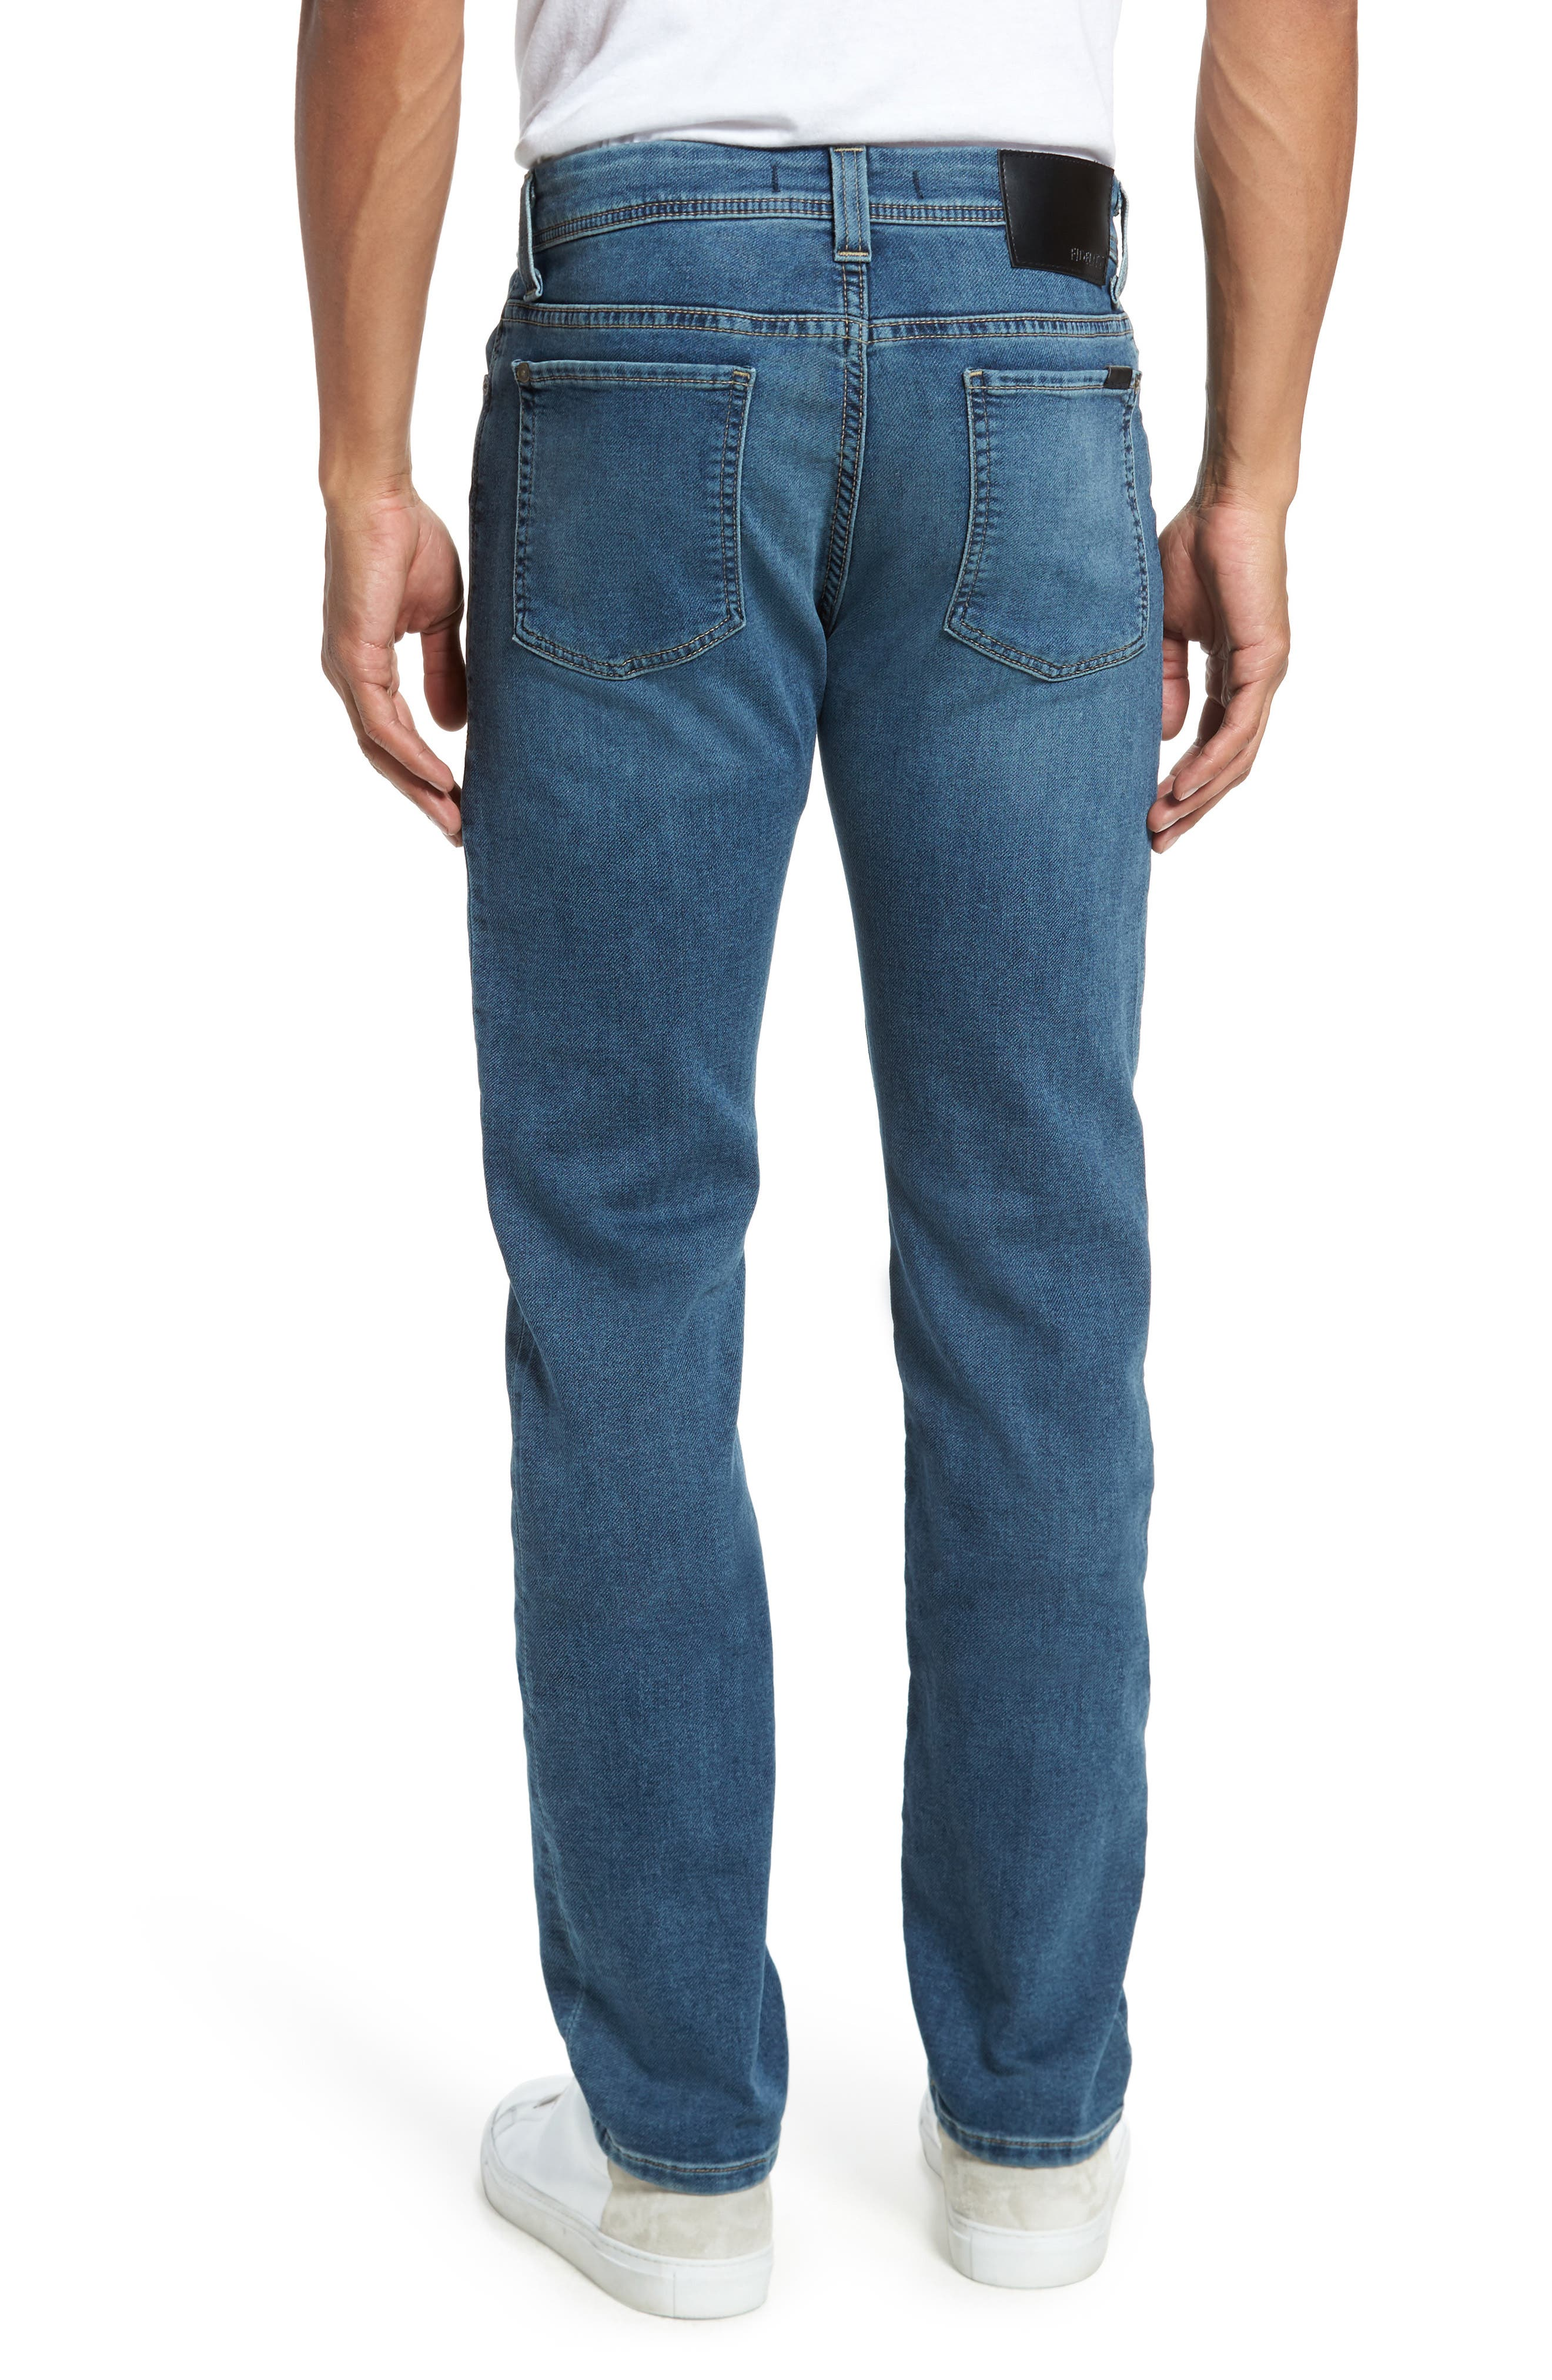 Torino Slim Fit Jeans,                             Alternate thumbnail 2, color,